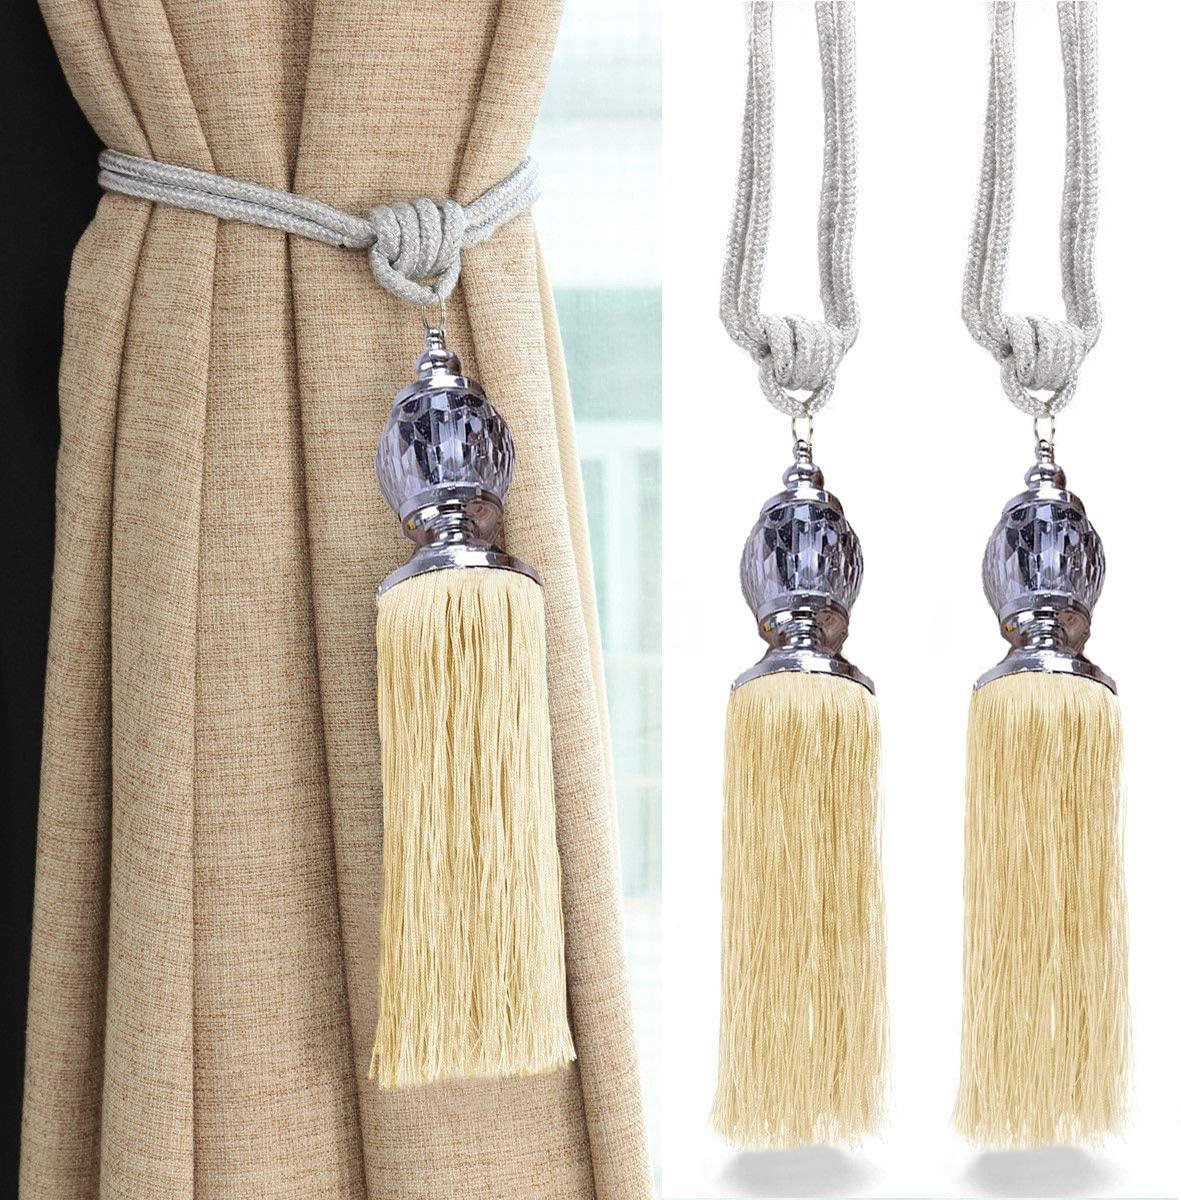 goowrom Crystal Beaded Curtain Tie Back 2pcs Tassel Tie Backs for Curtain Beautiful Curtain Holdback Rope(Light Jade)